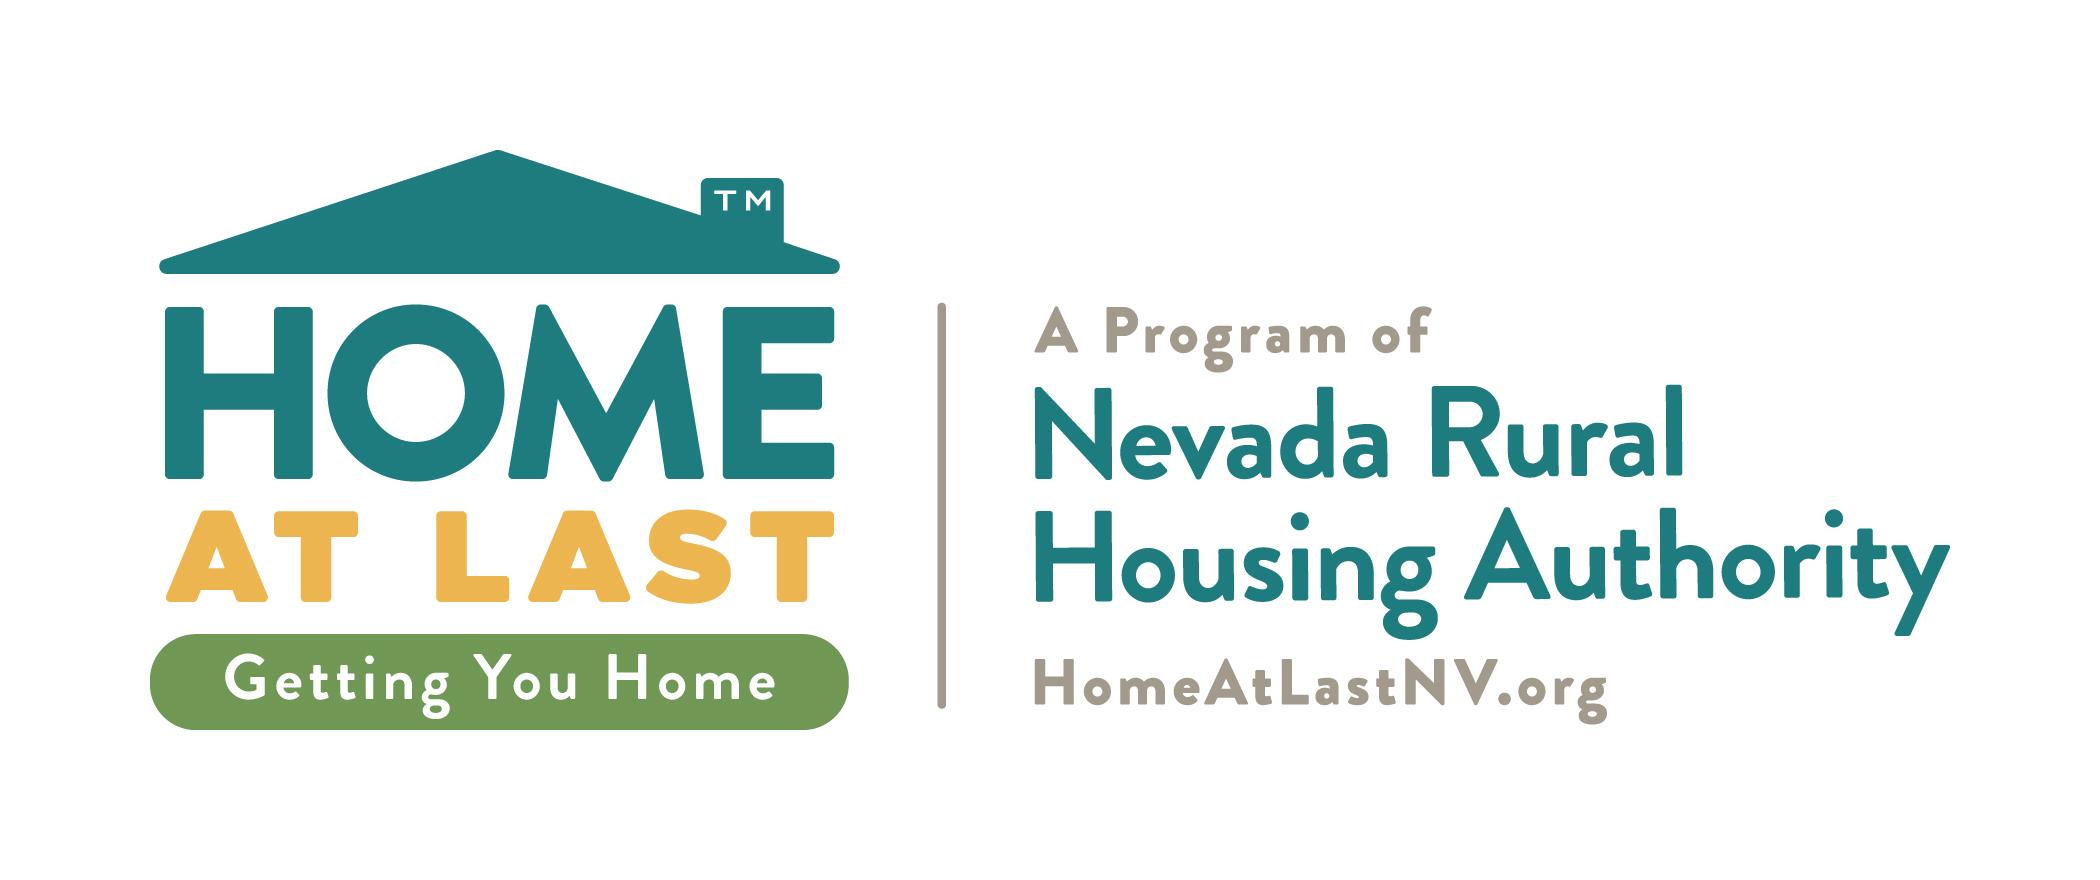 Nevada Rural Housing Authority